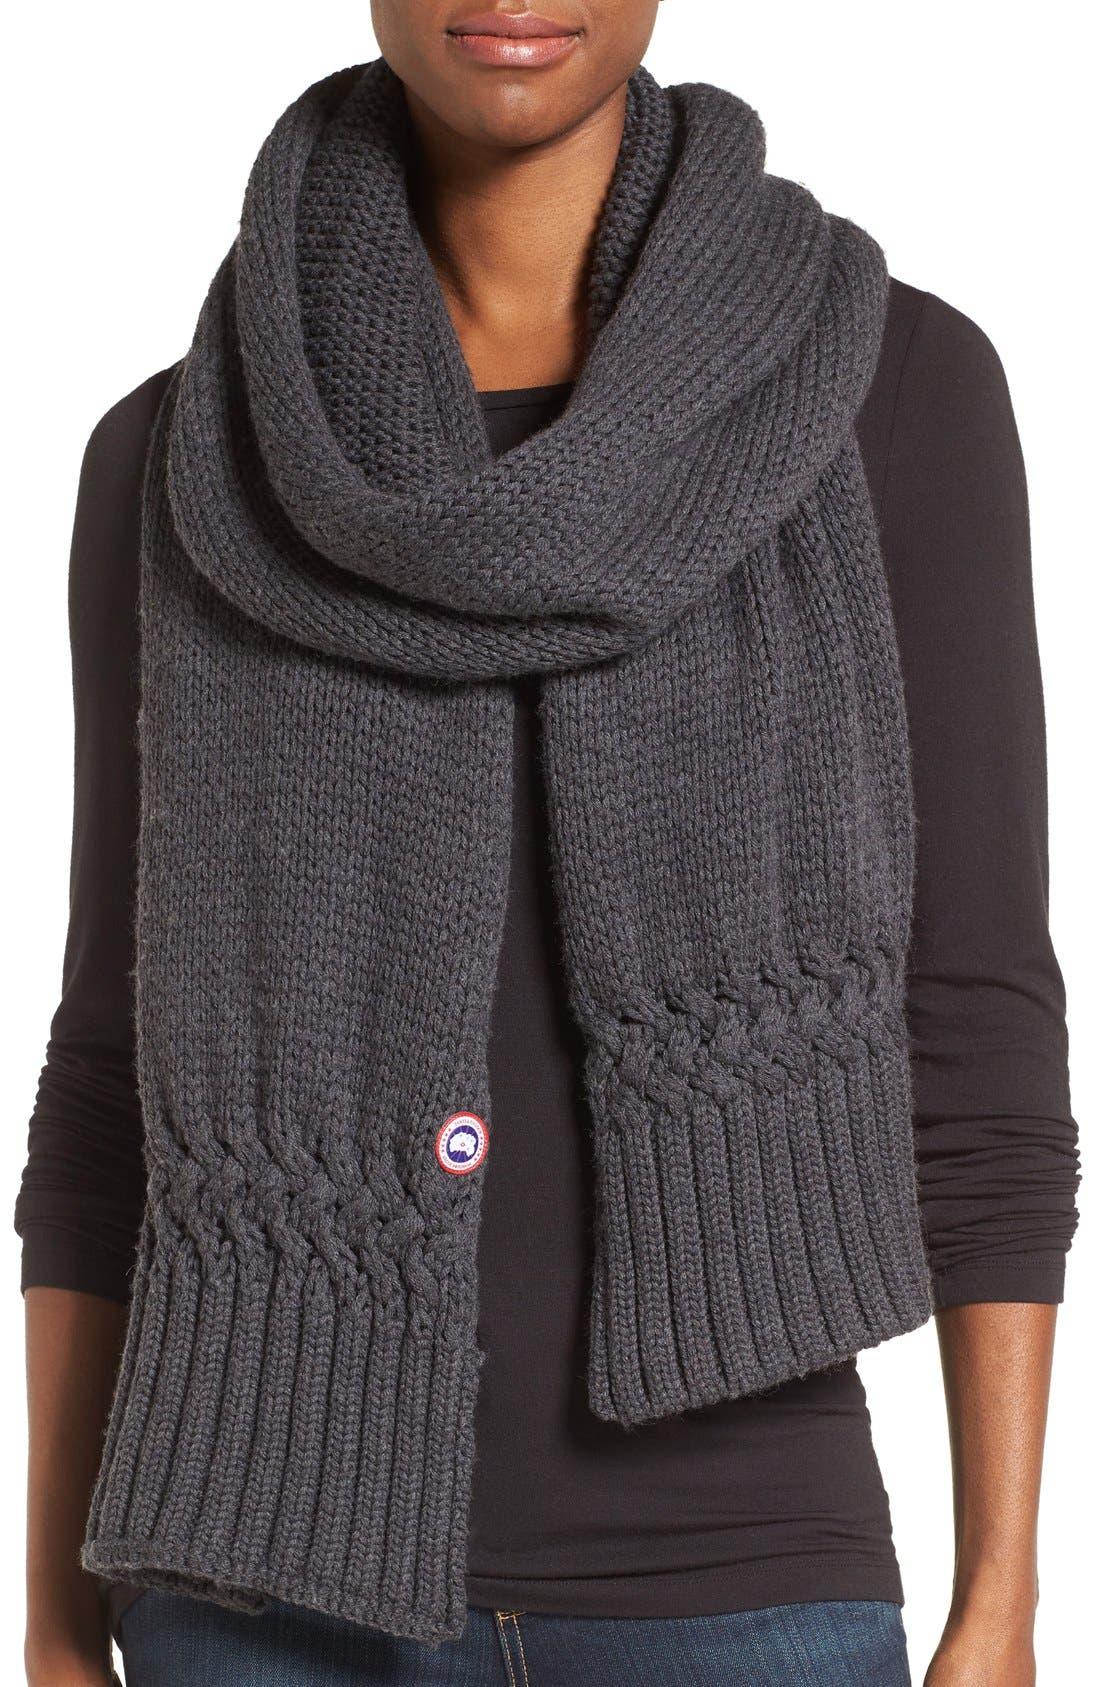 Alternate Image 1 Selected - Canada Goose Knit Merino Wool Scarf